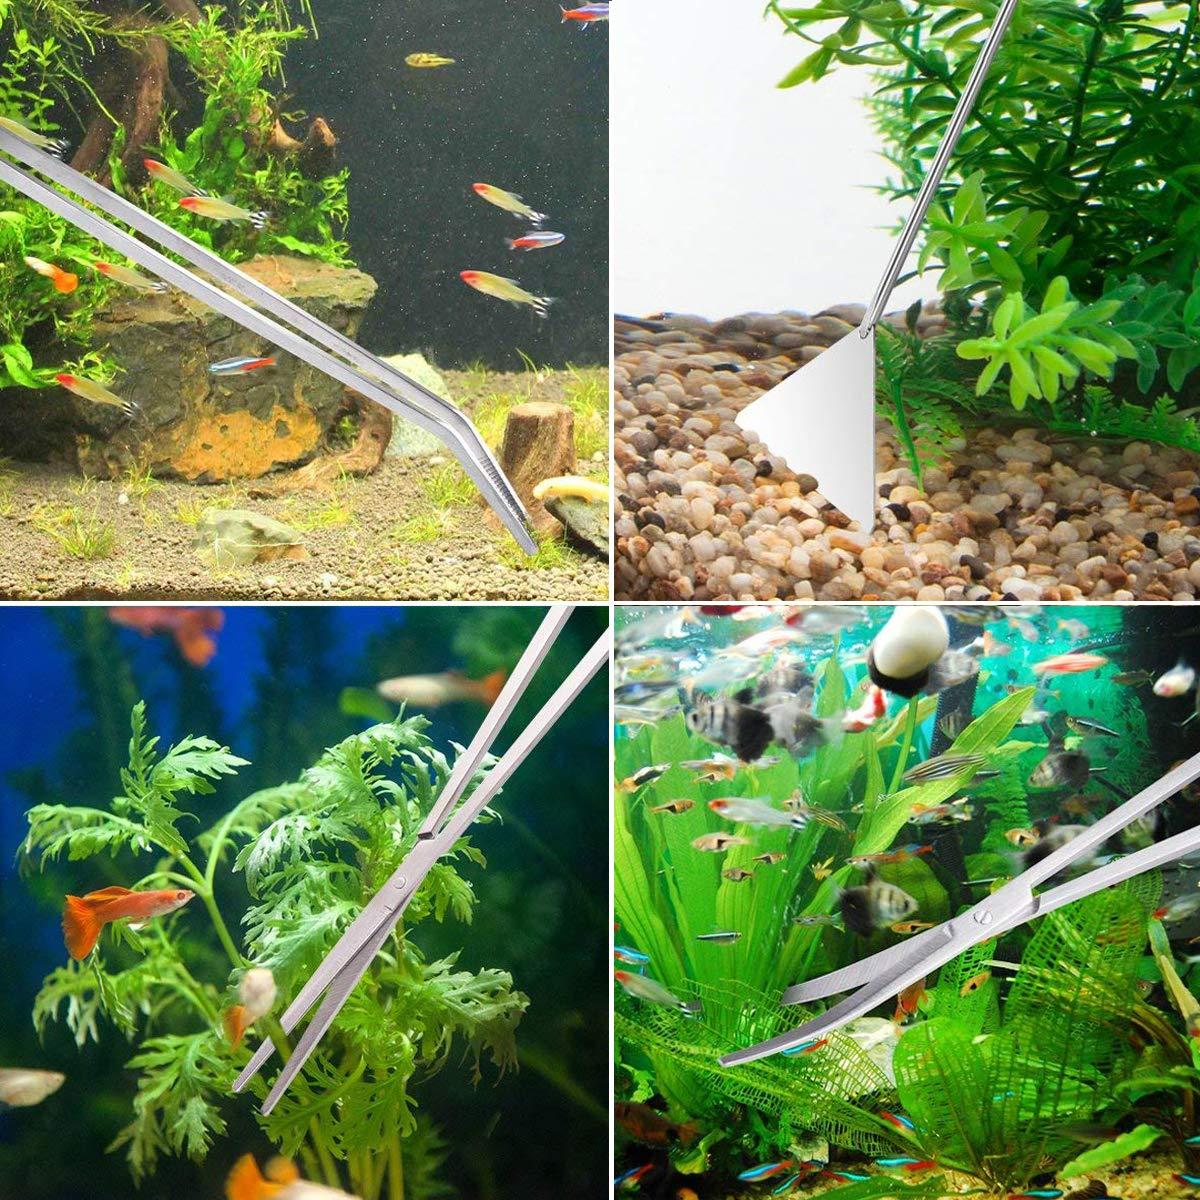 Bedee Fish Tank Cleaning Kit 6 In 1 Aquarium Glass Tank Cleaning Kit With Gravel Cleaning & Maintenance Pet Supplies